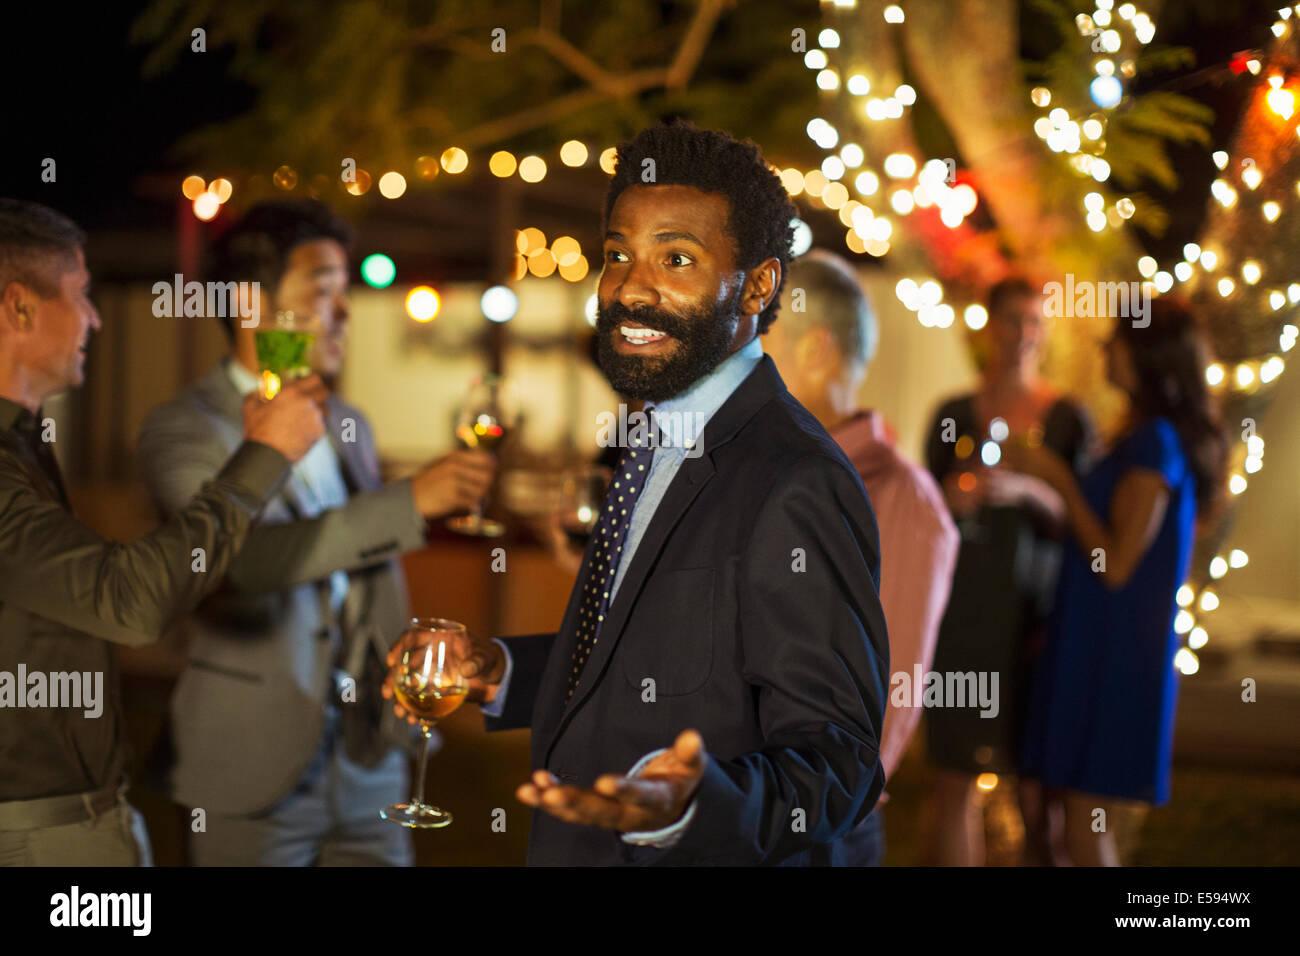 L'uomo gesticolando con vino a parte Foto Stock